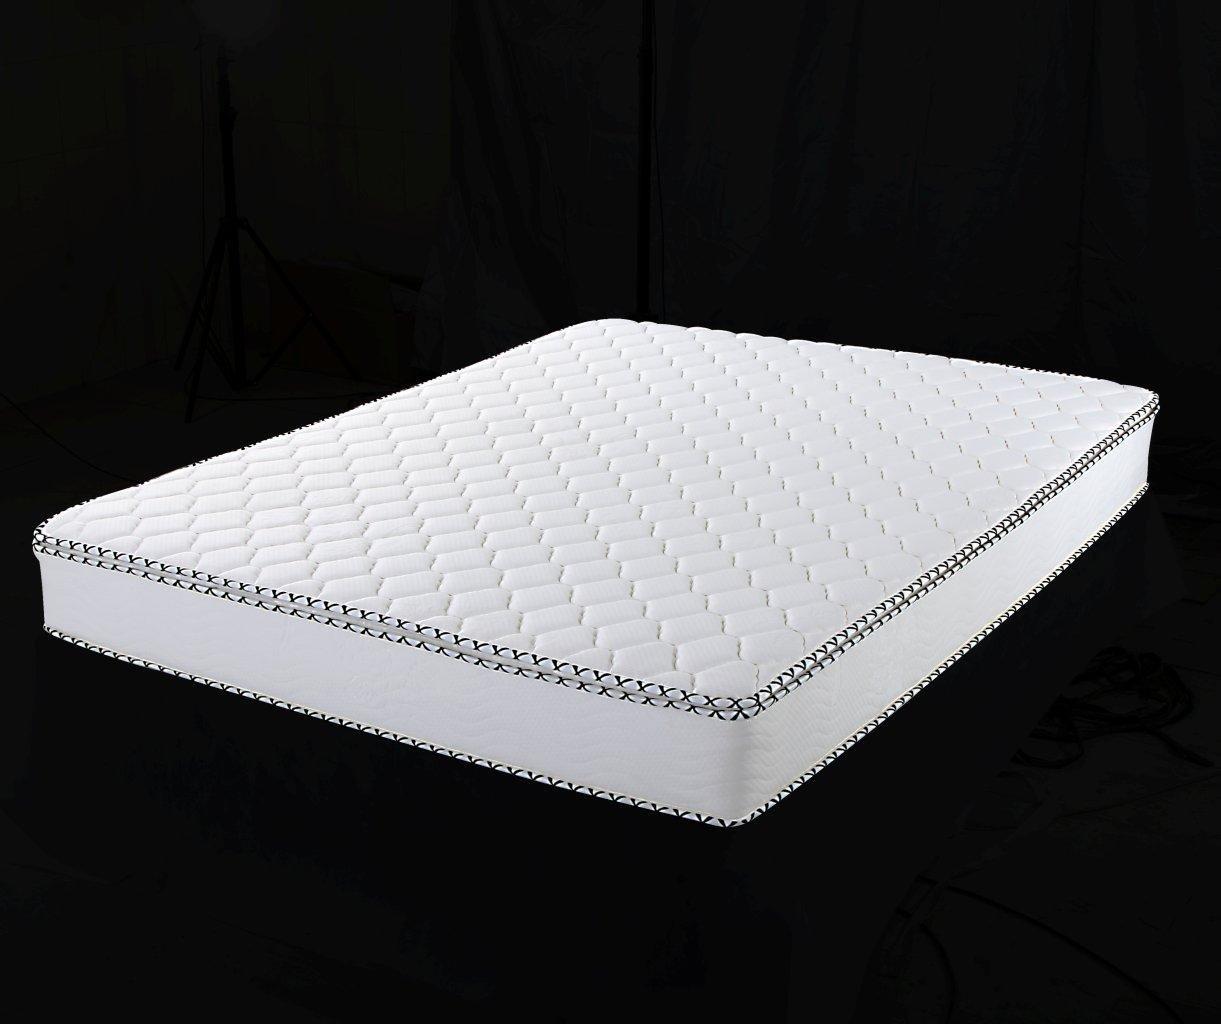 Home Life Pillow Top Harmony Sleep 8-Inch Pocket Spring Luxury Mattress Green Foam Certified, Twin